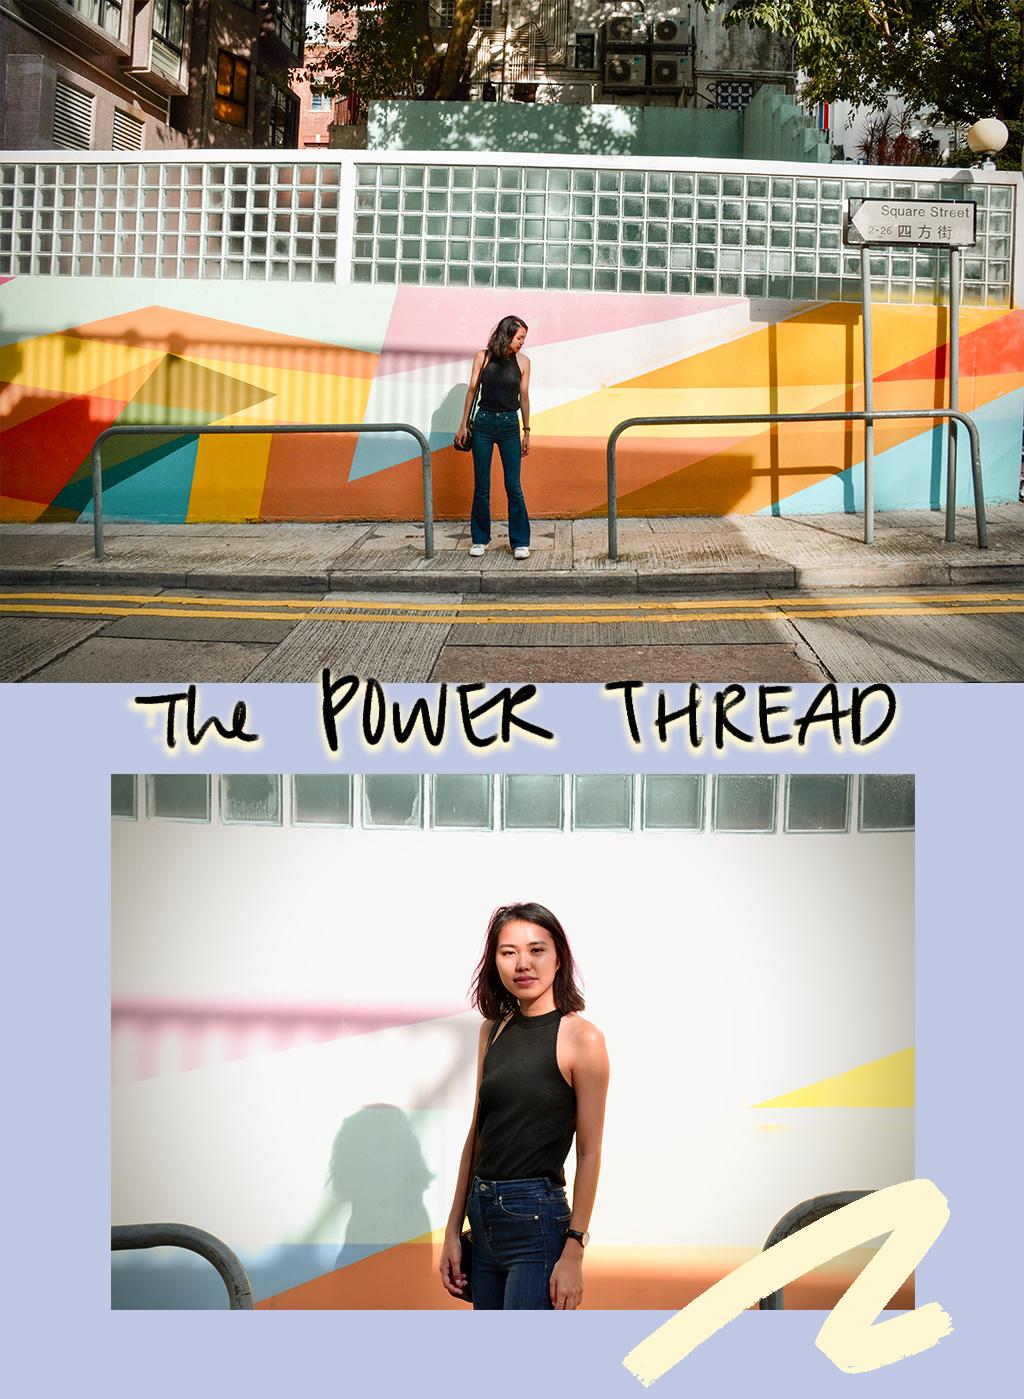 powerthreadArtboard 2.jpg